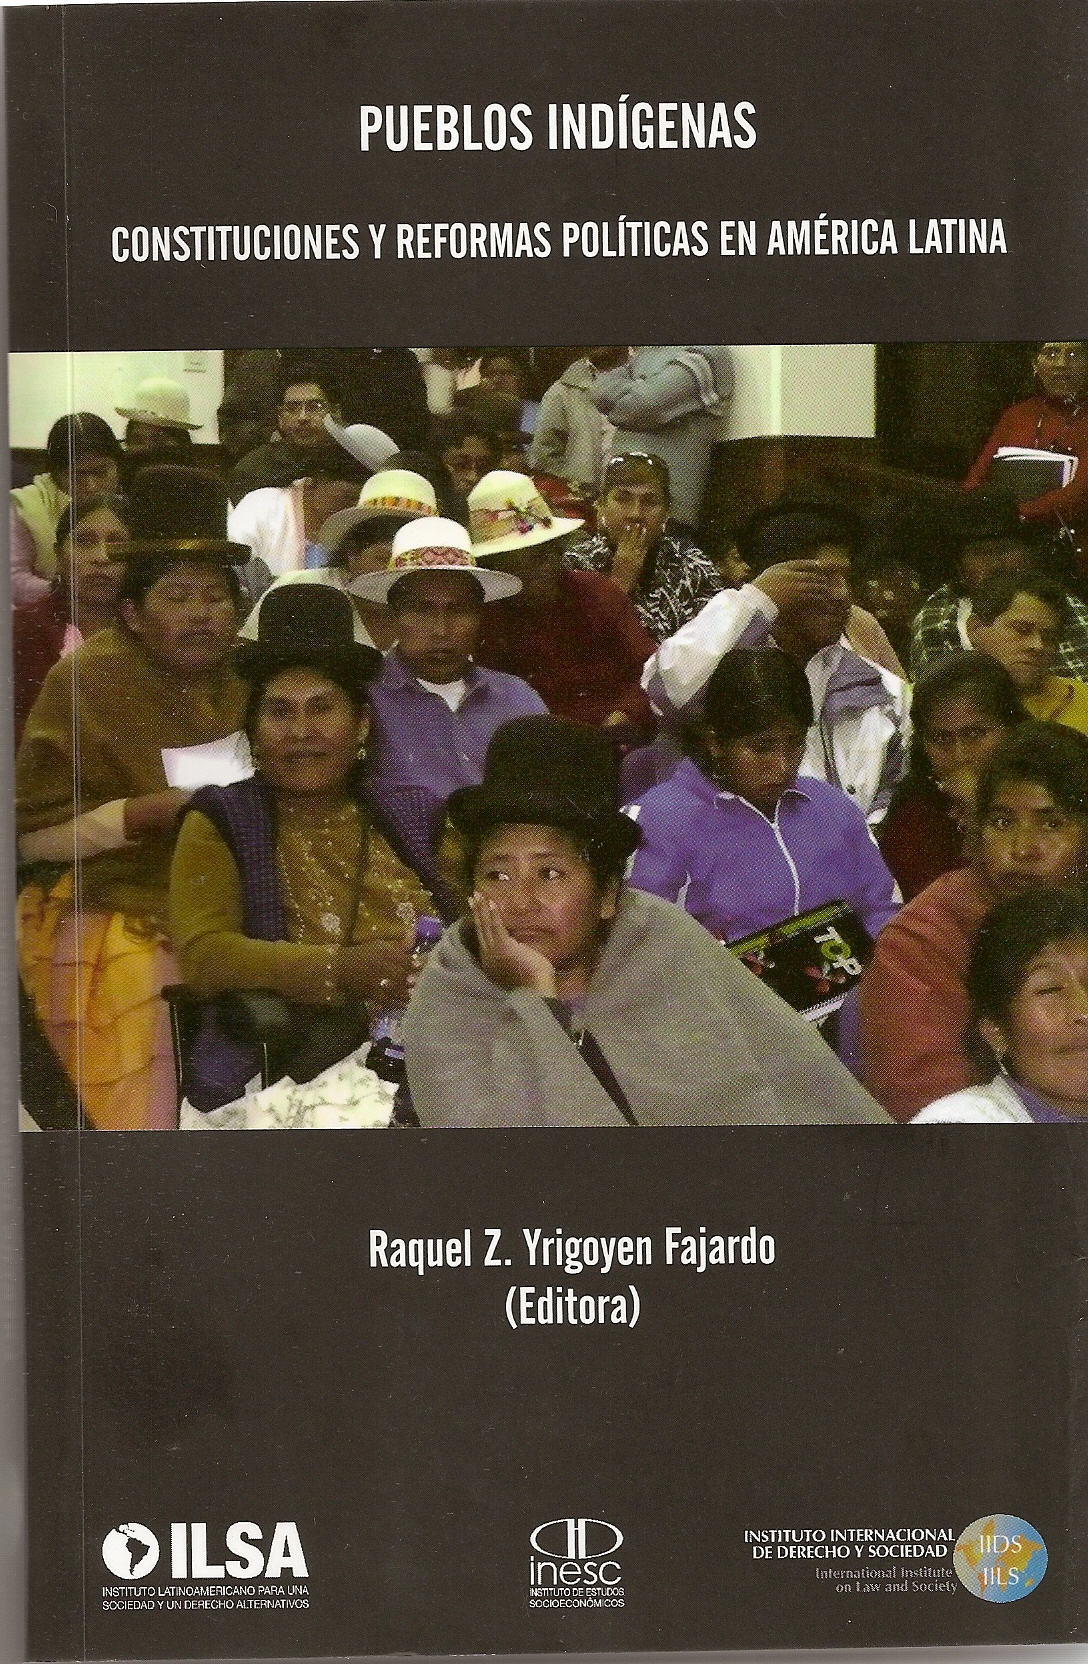 Raquel Yrigoyen Fajardo - Curriculum Vitae